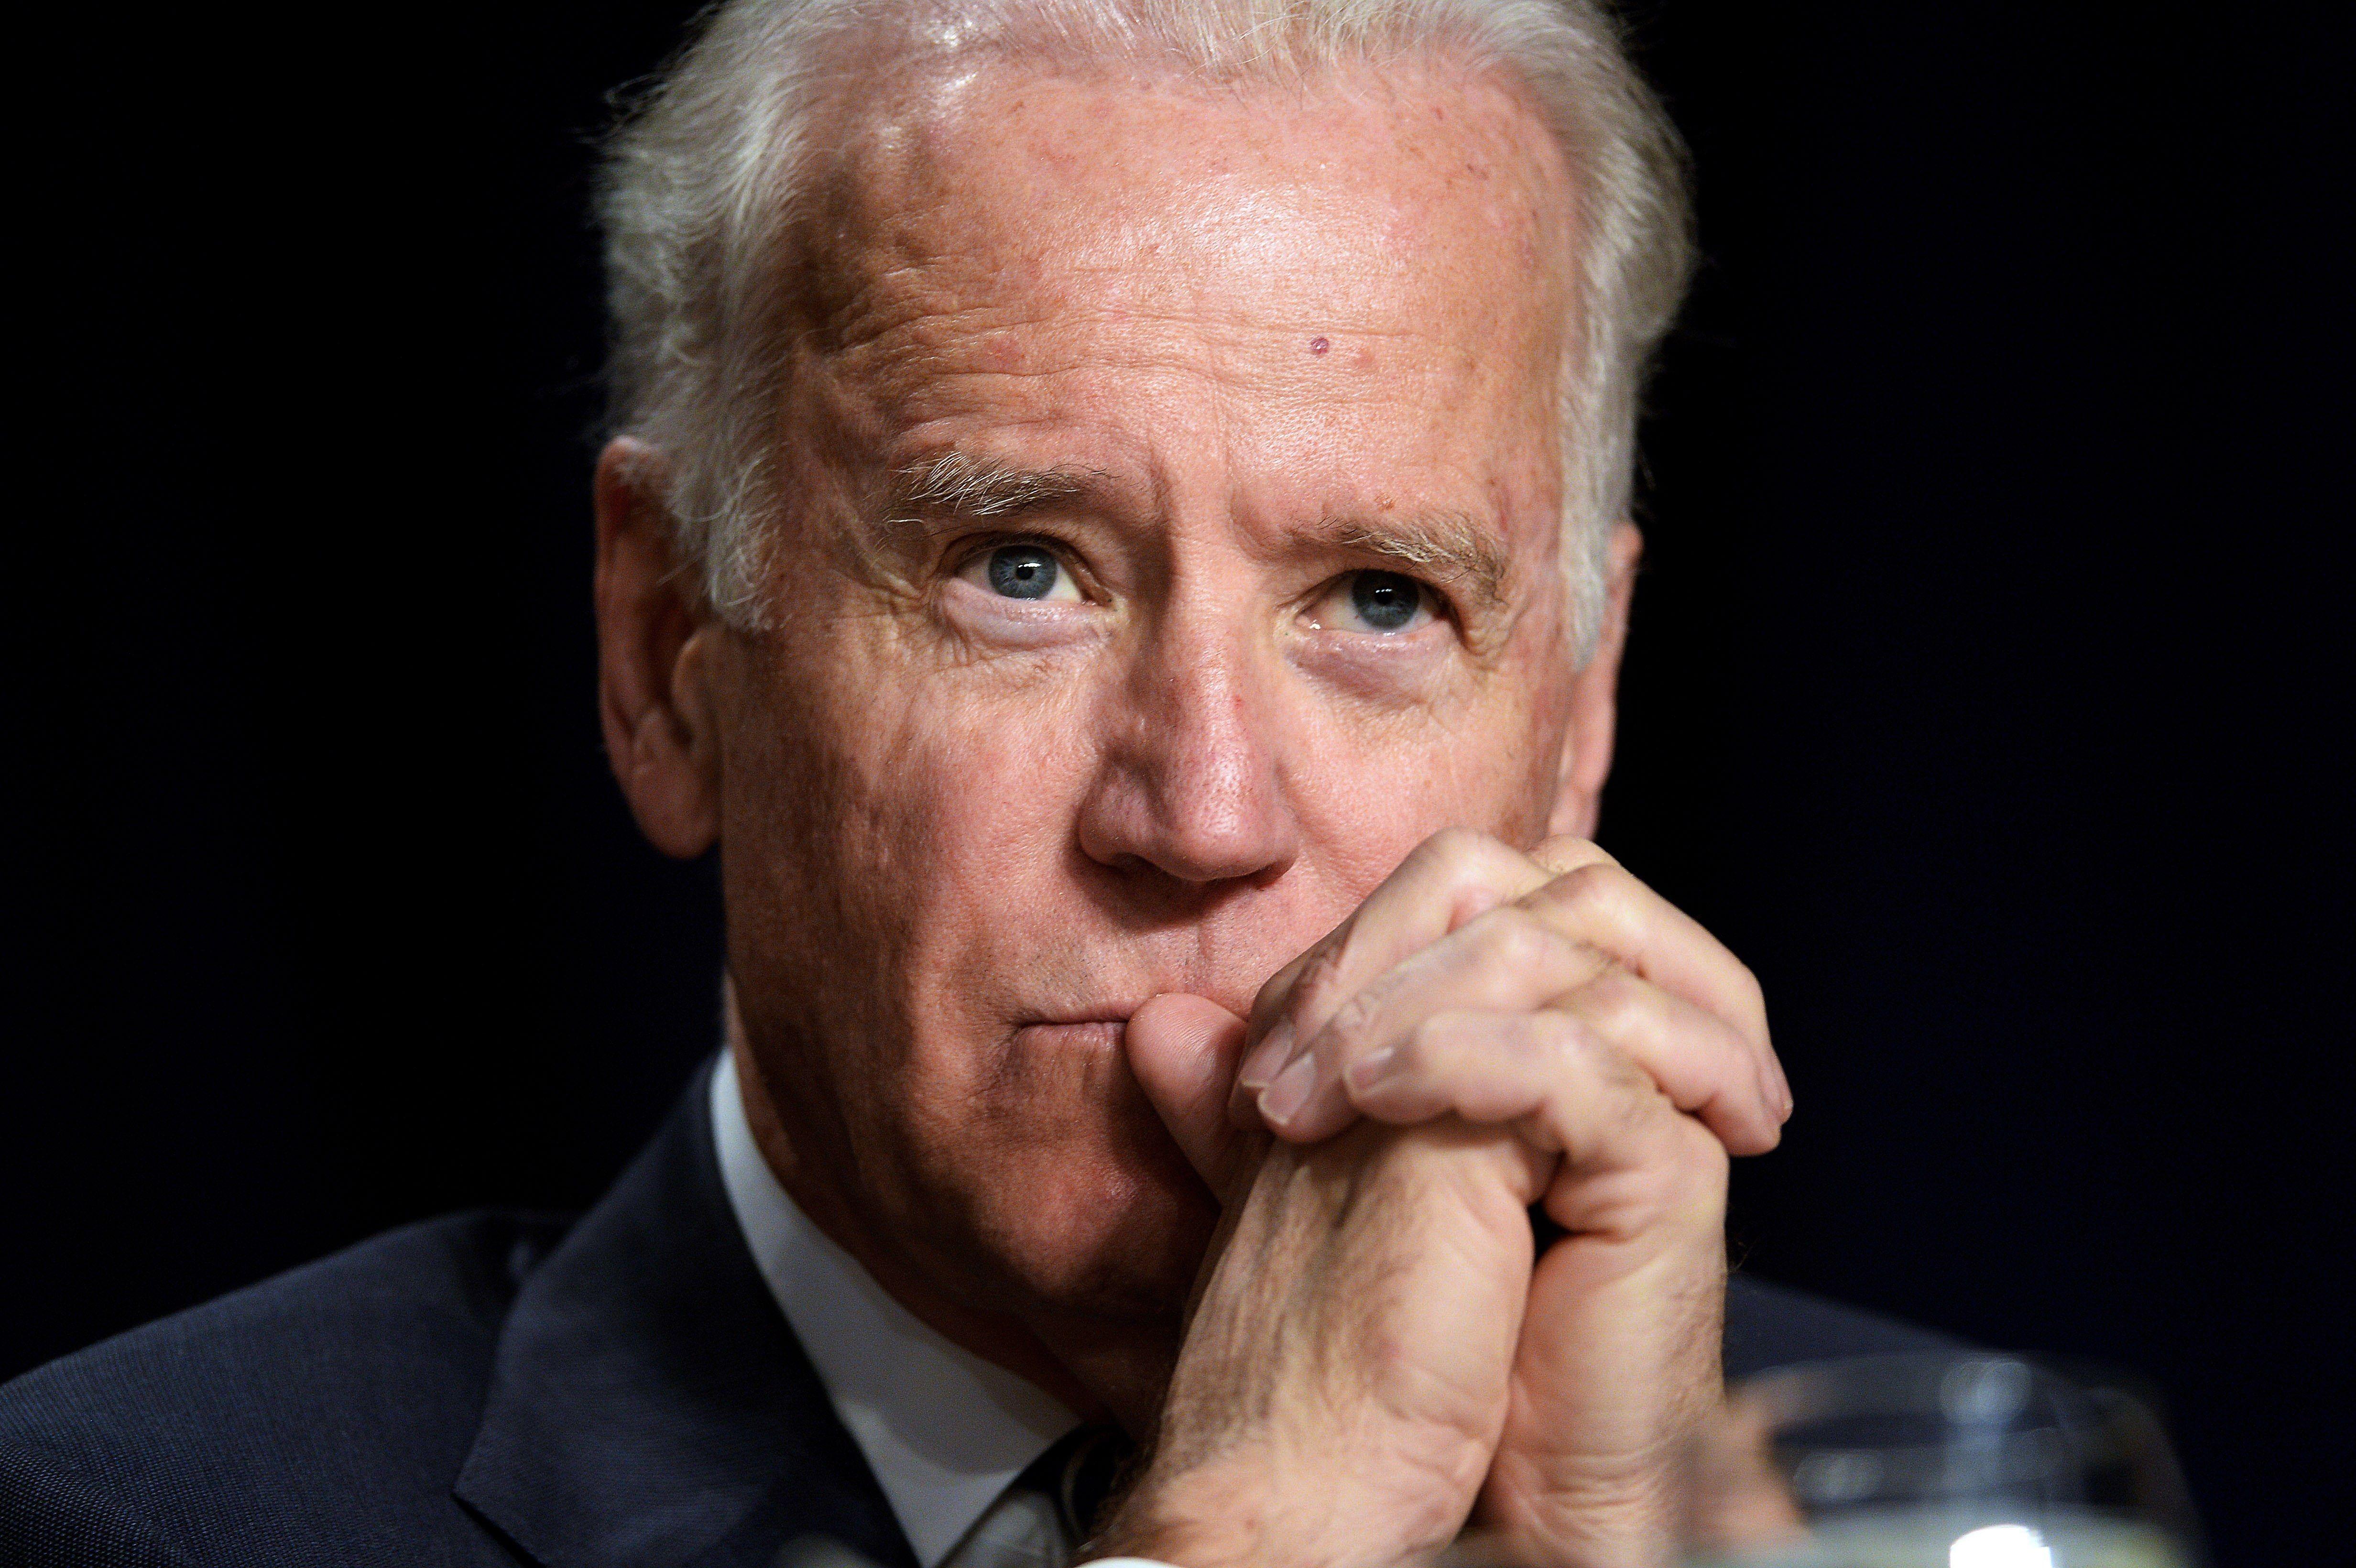 Vice President Joe Biden Says College Men Who Listen To